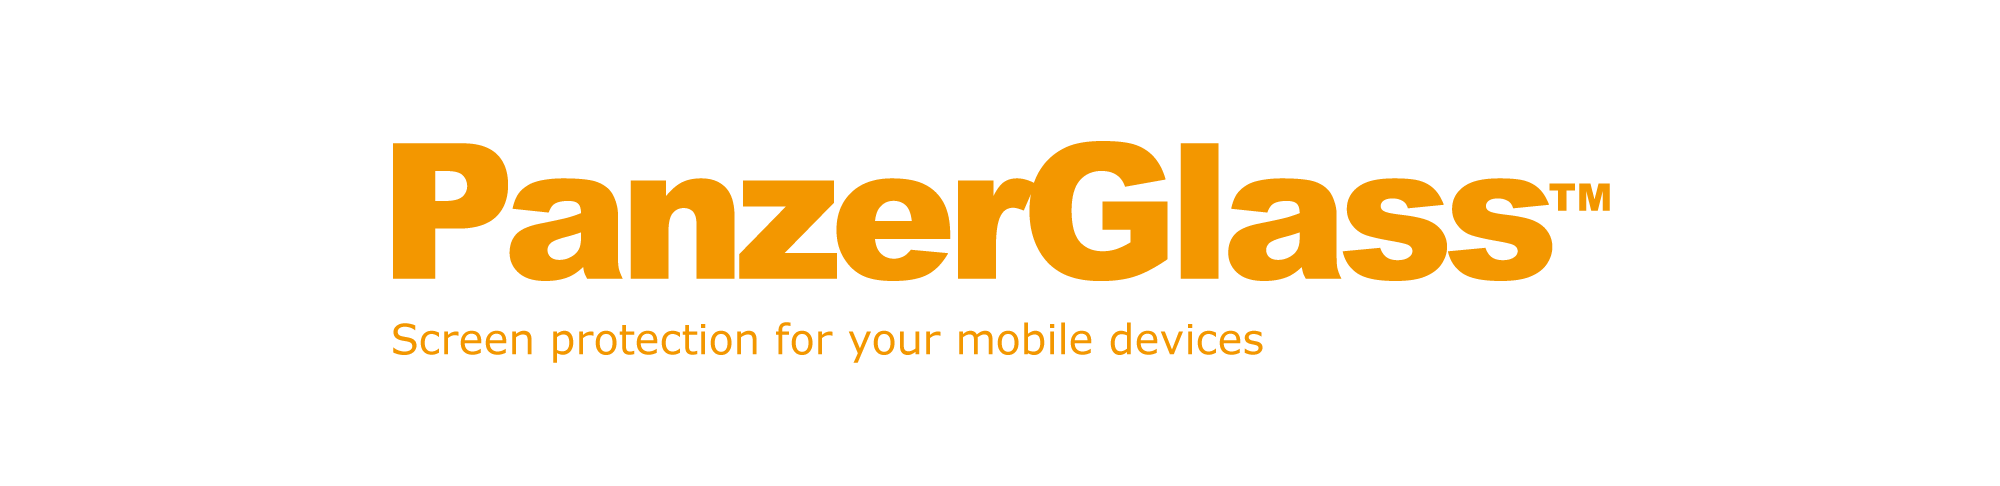 panzerglass-logo-white